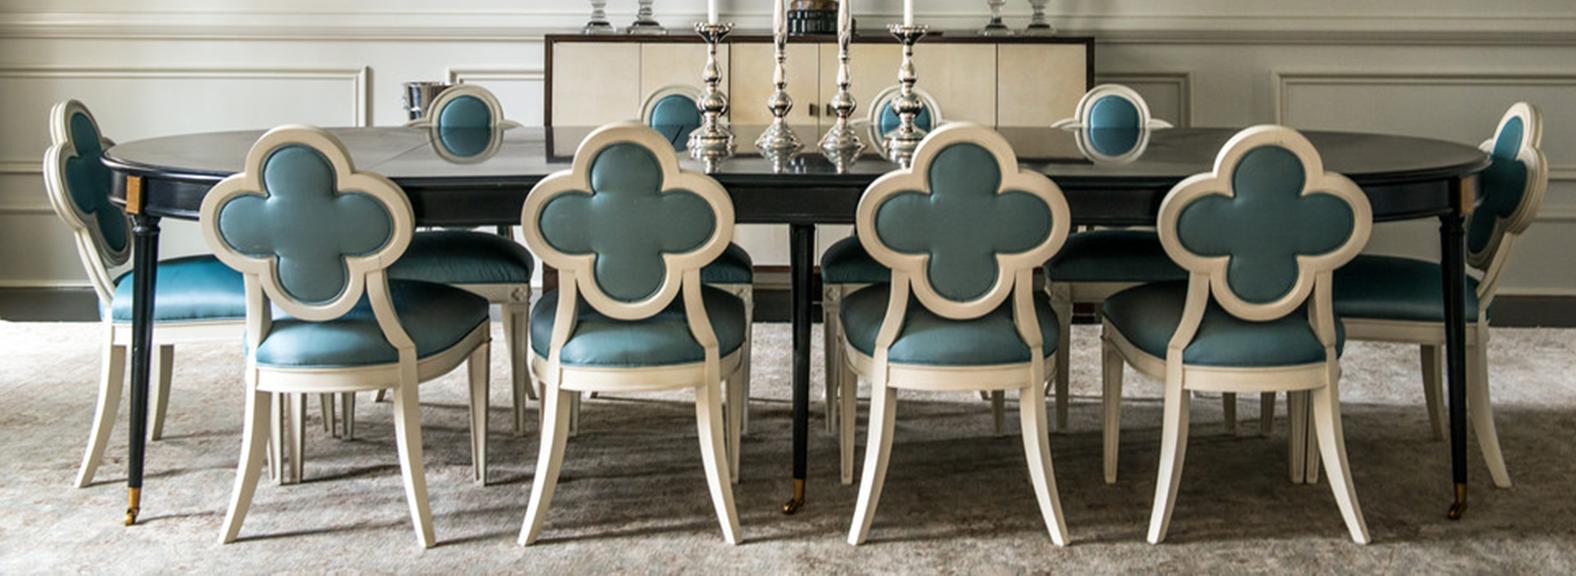 ChairCareSlider_0026_Atlanta-beige_molding-beige_paneling-beige_trim-beige_wainscoting-black_table-blue_chair-buffet_tab